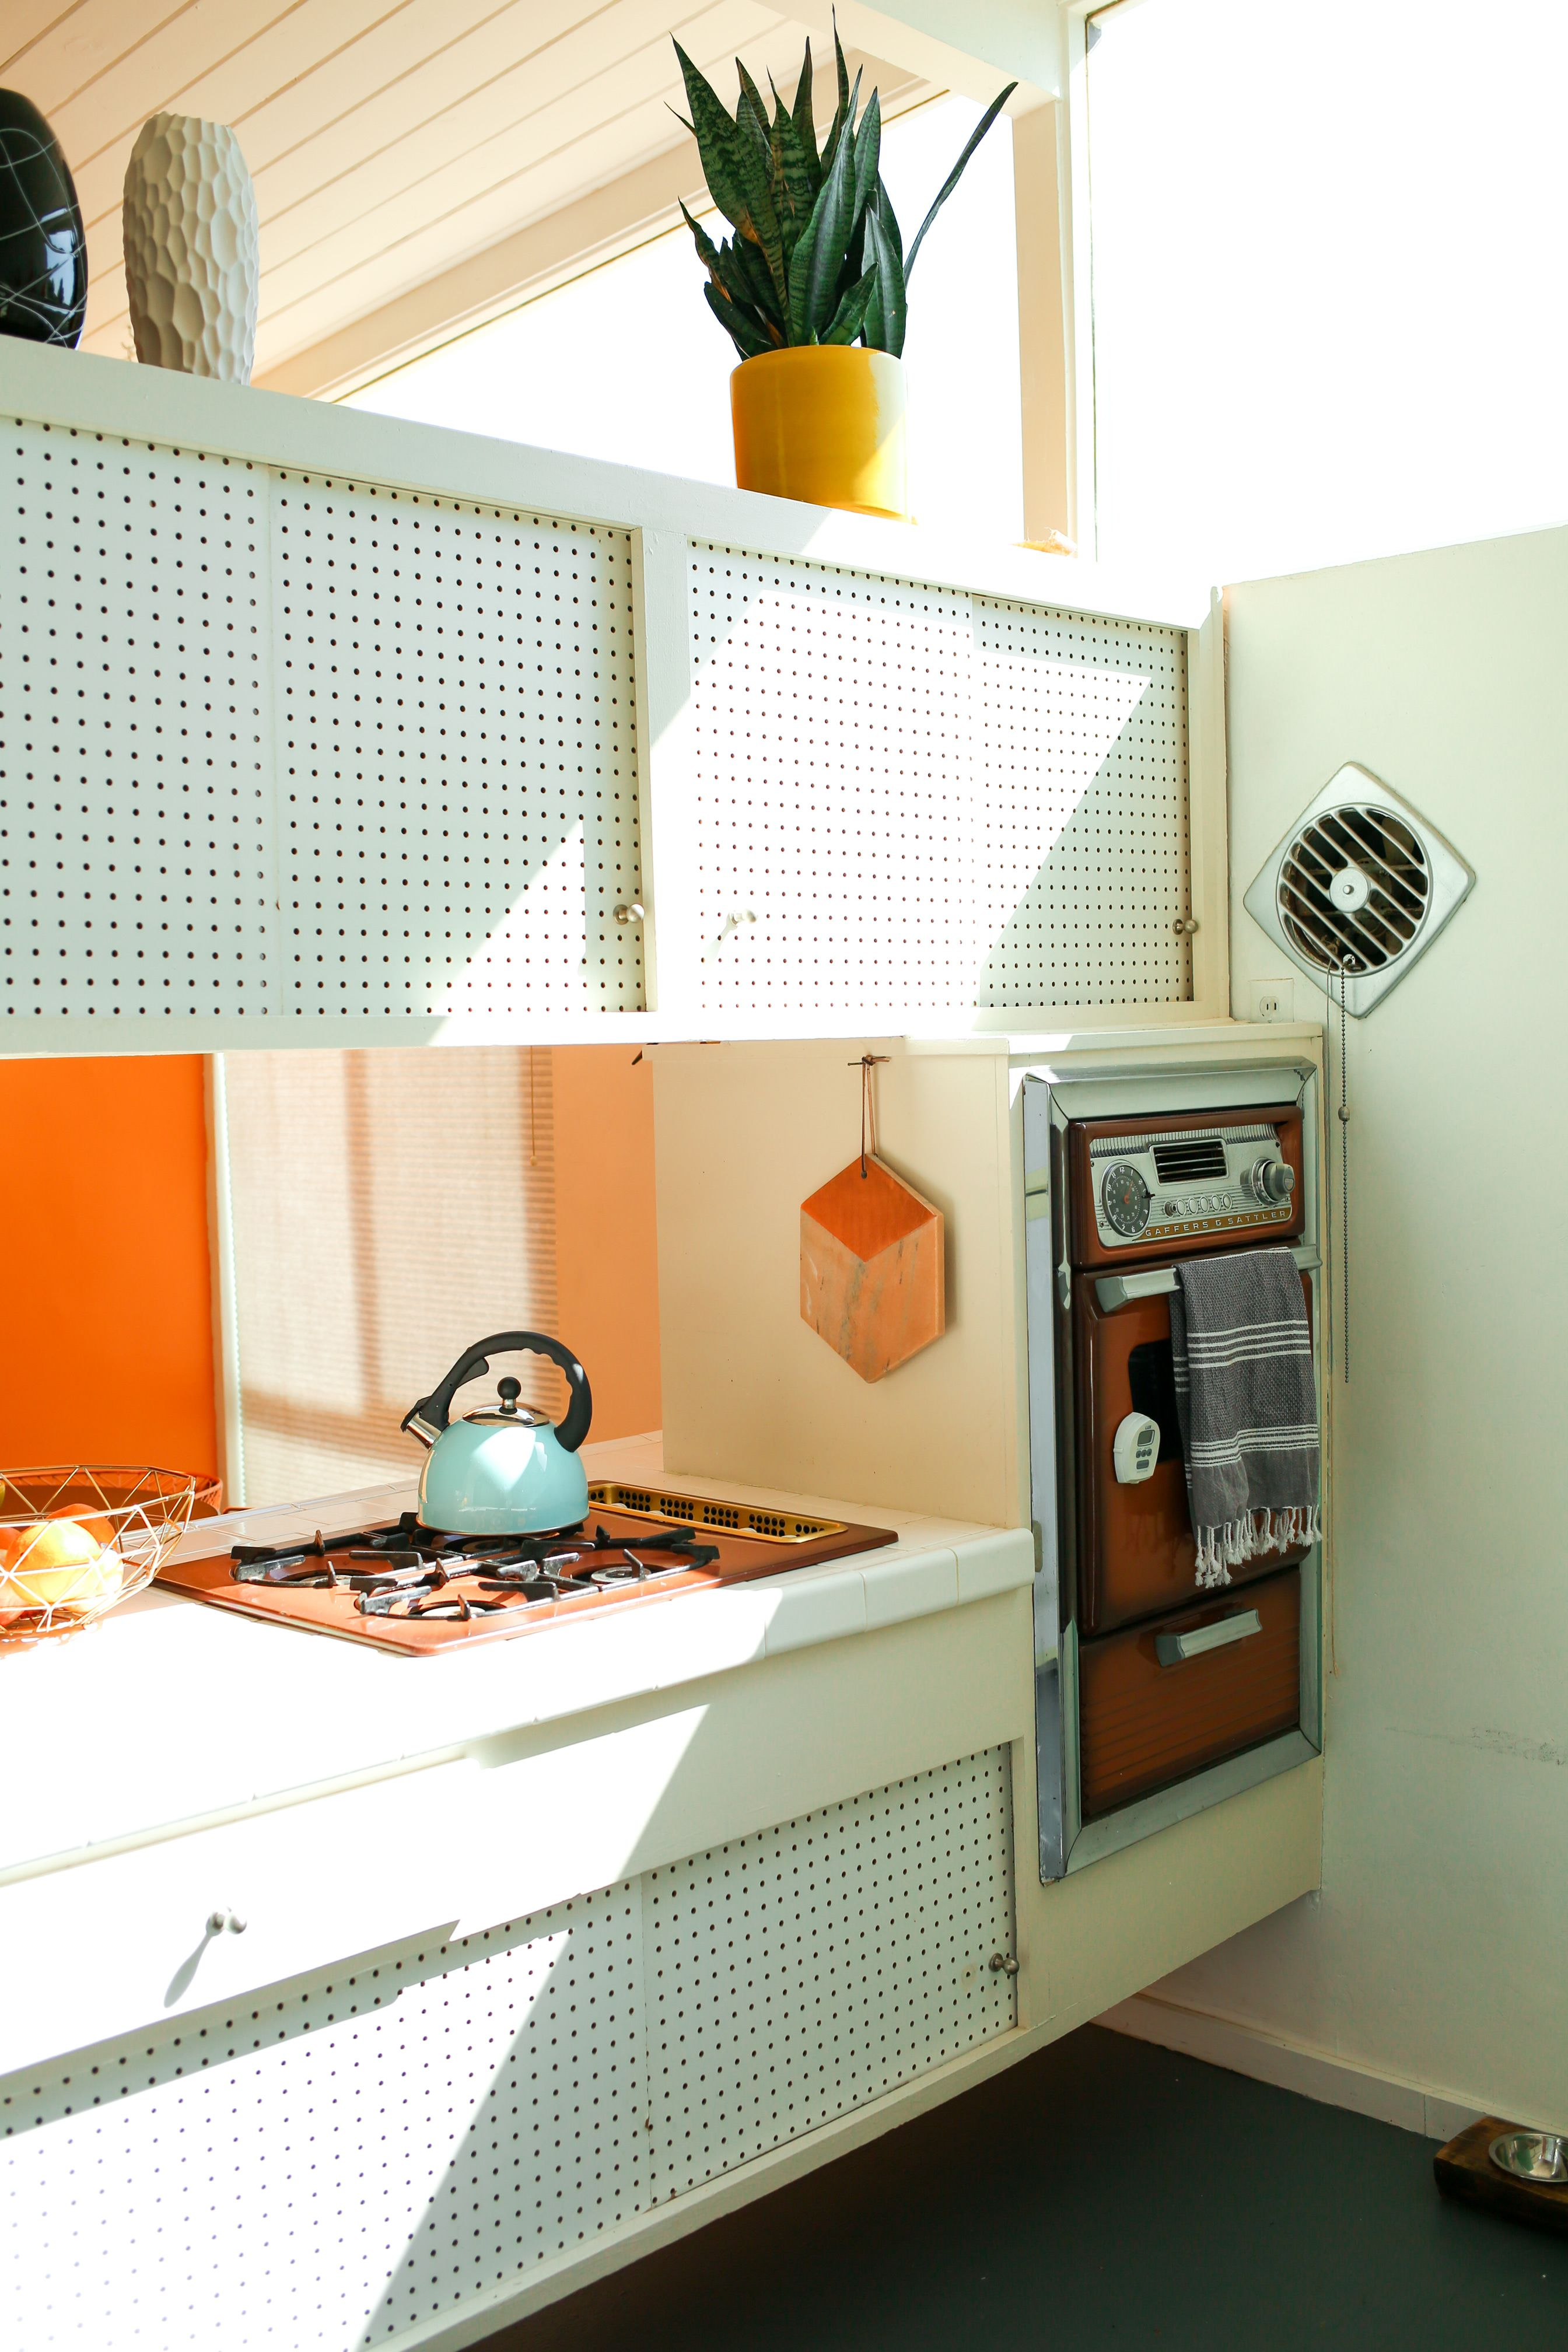 Danielle Nagel Dazey La Founder Retro Palm Spring Home Desert Homes Kitchen Style Quirky Home Decor